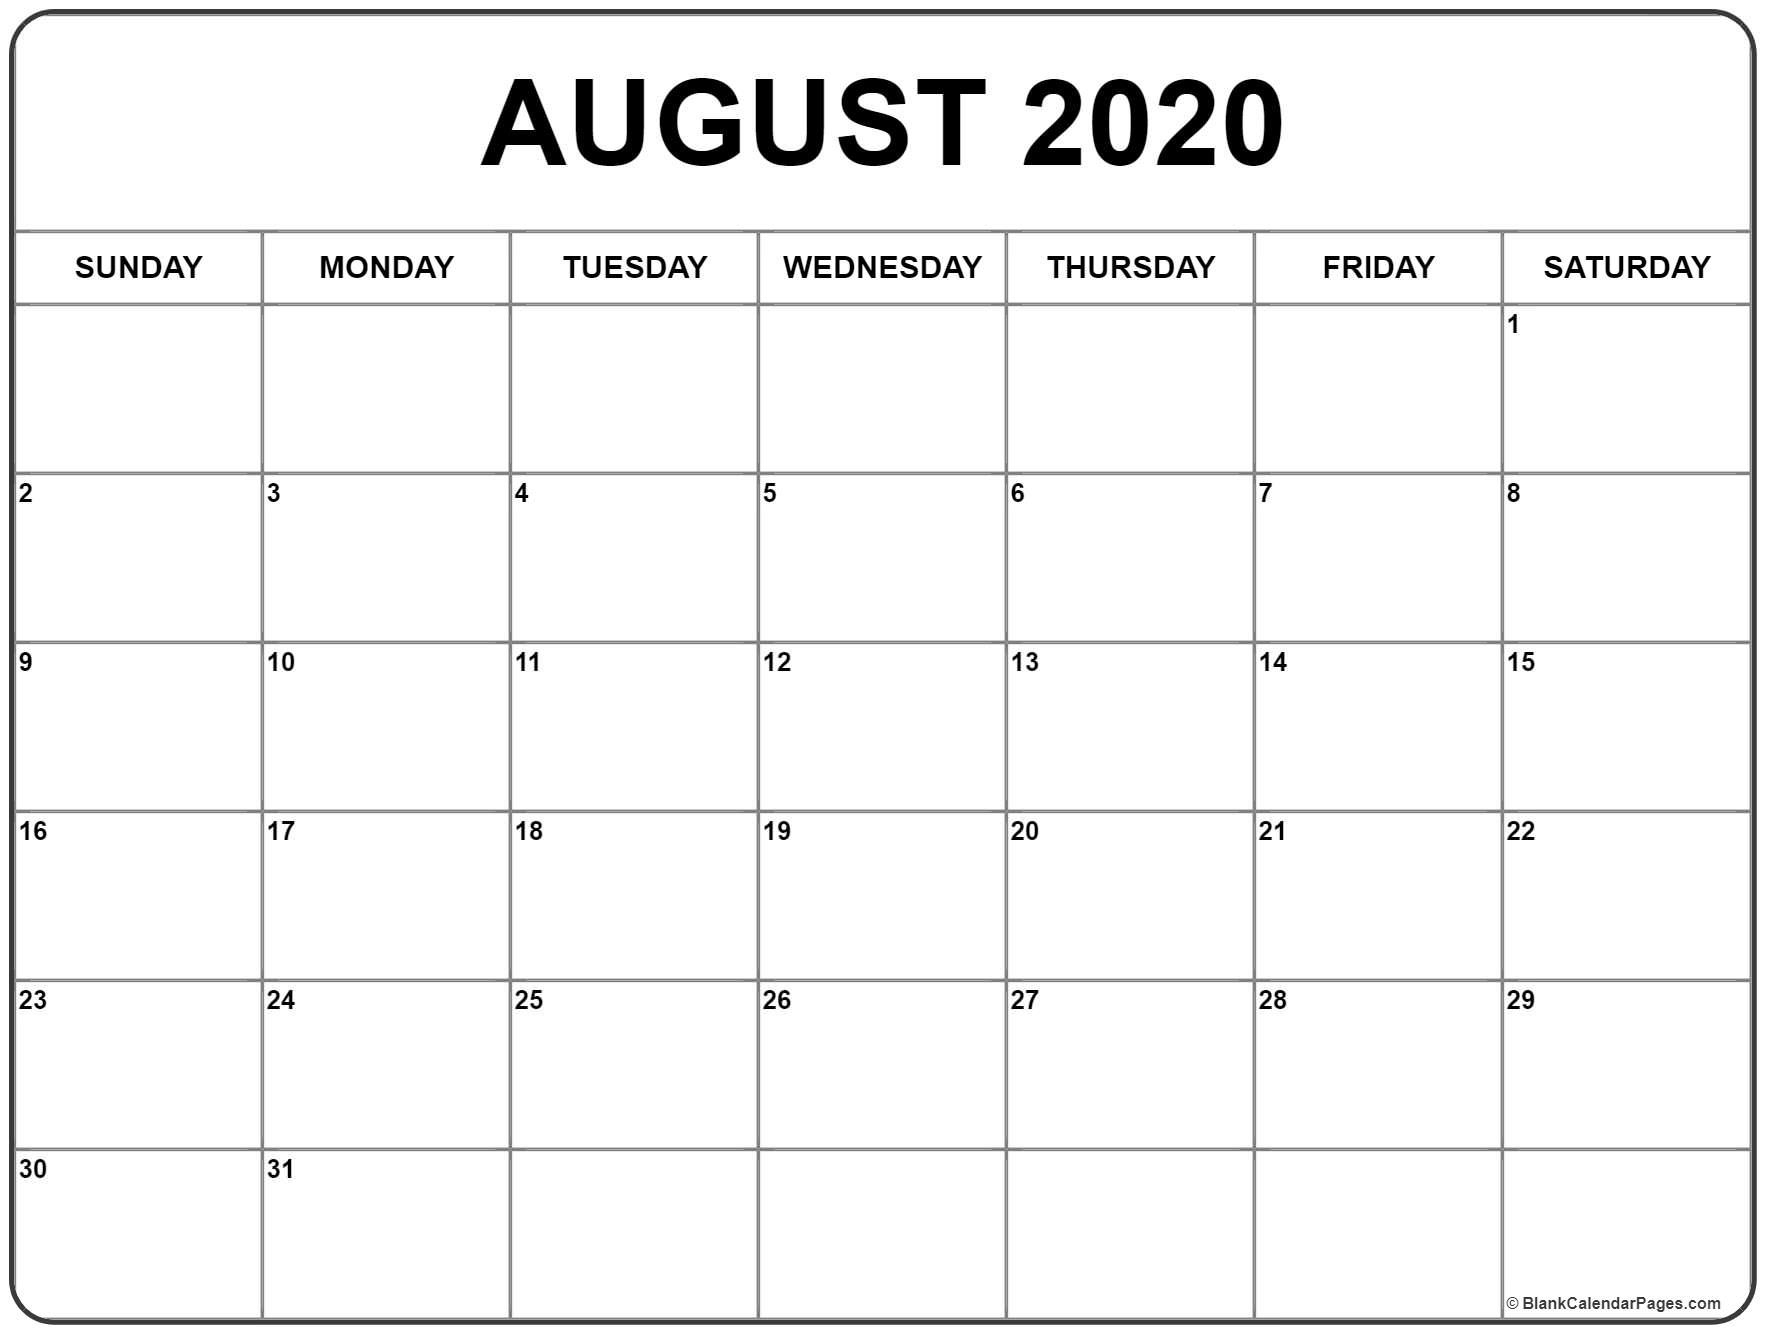 August 2020 Calendar | August Calendar, Blank Calendar